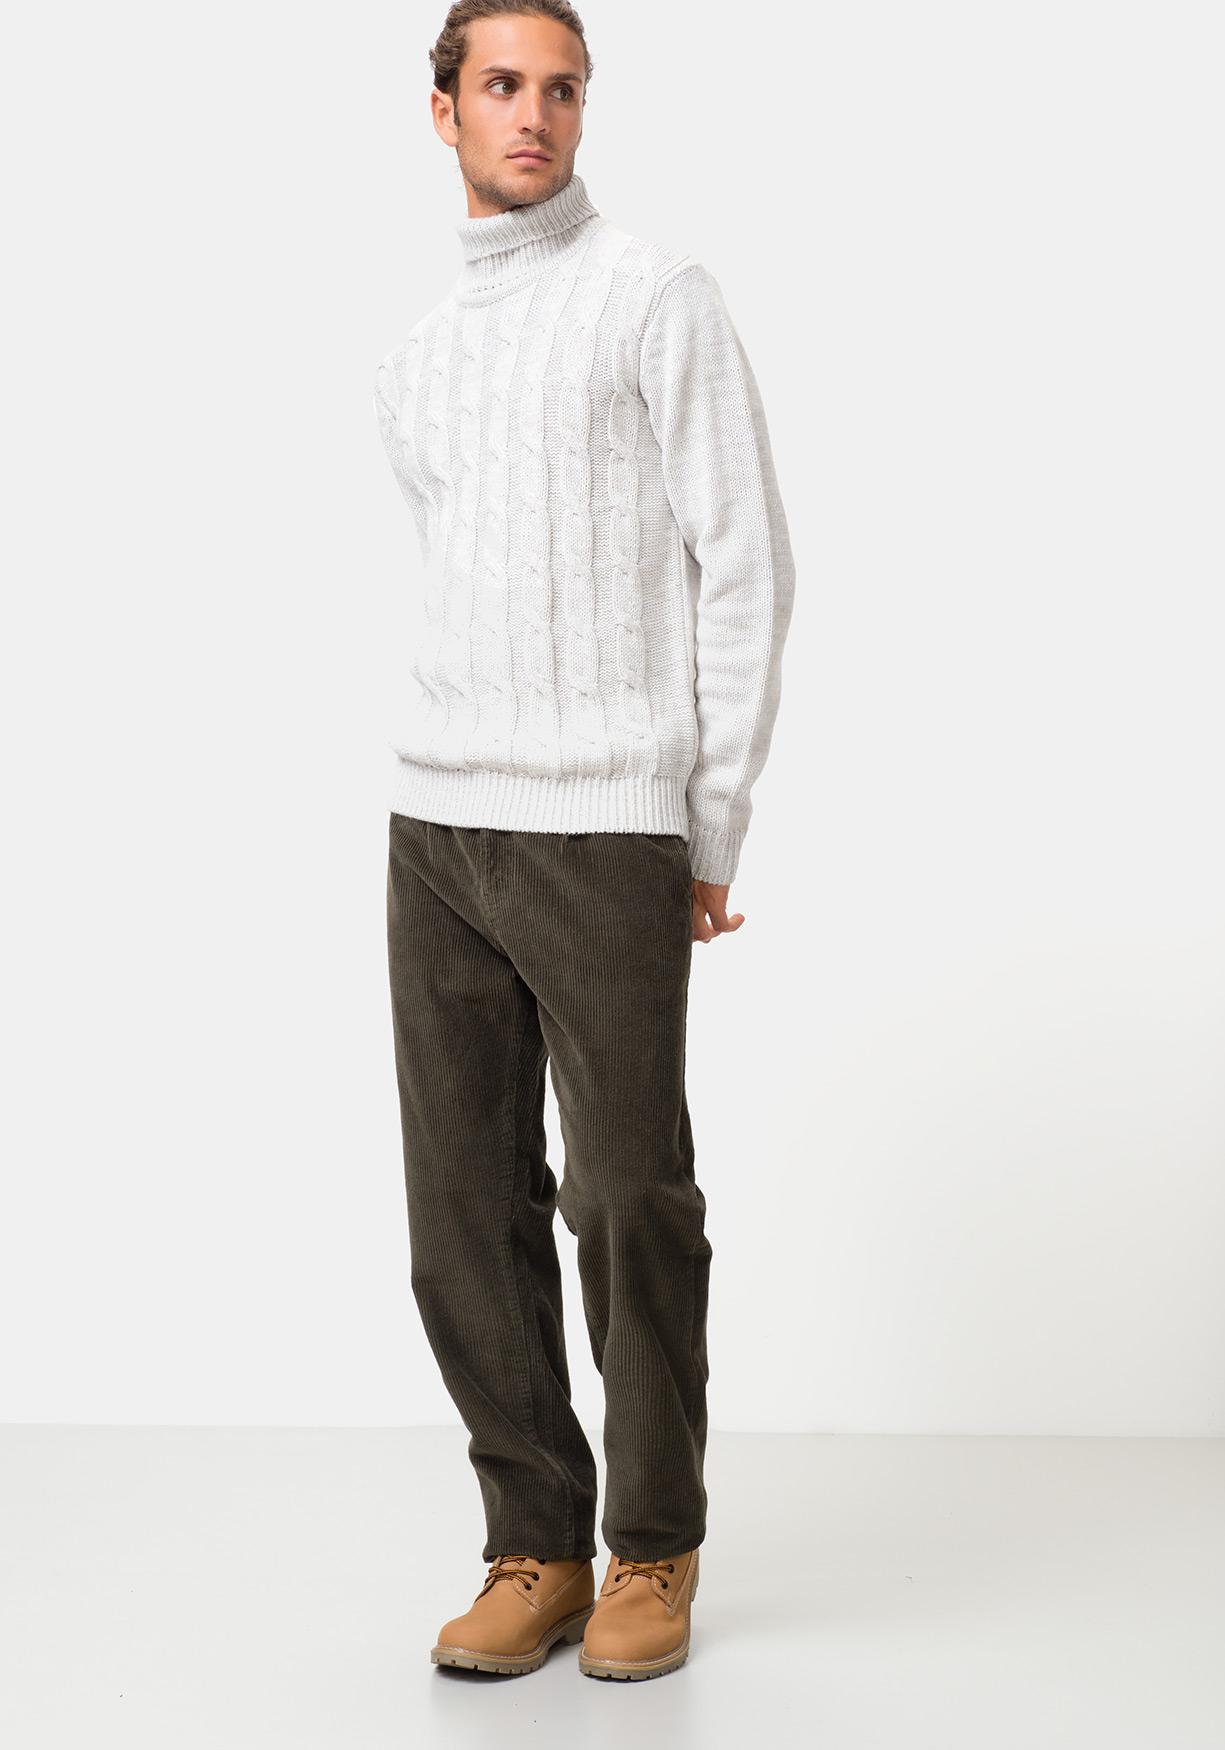 75e0ac8f88 Comprar Pantalón tallas grandes de pana TEX. ¡Aprovéchate de ...